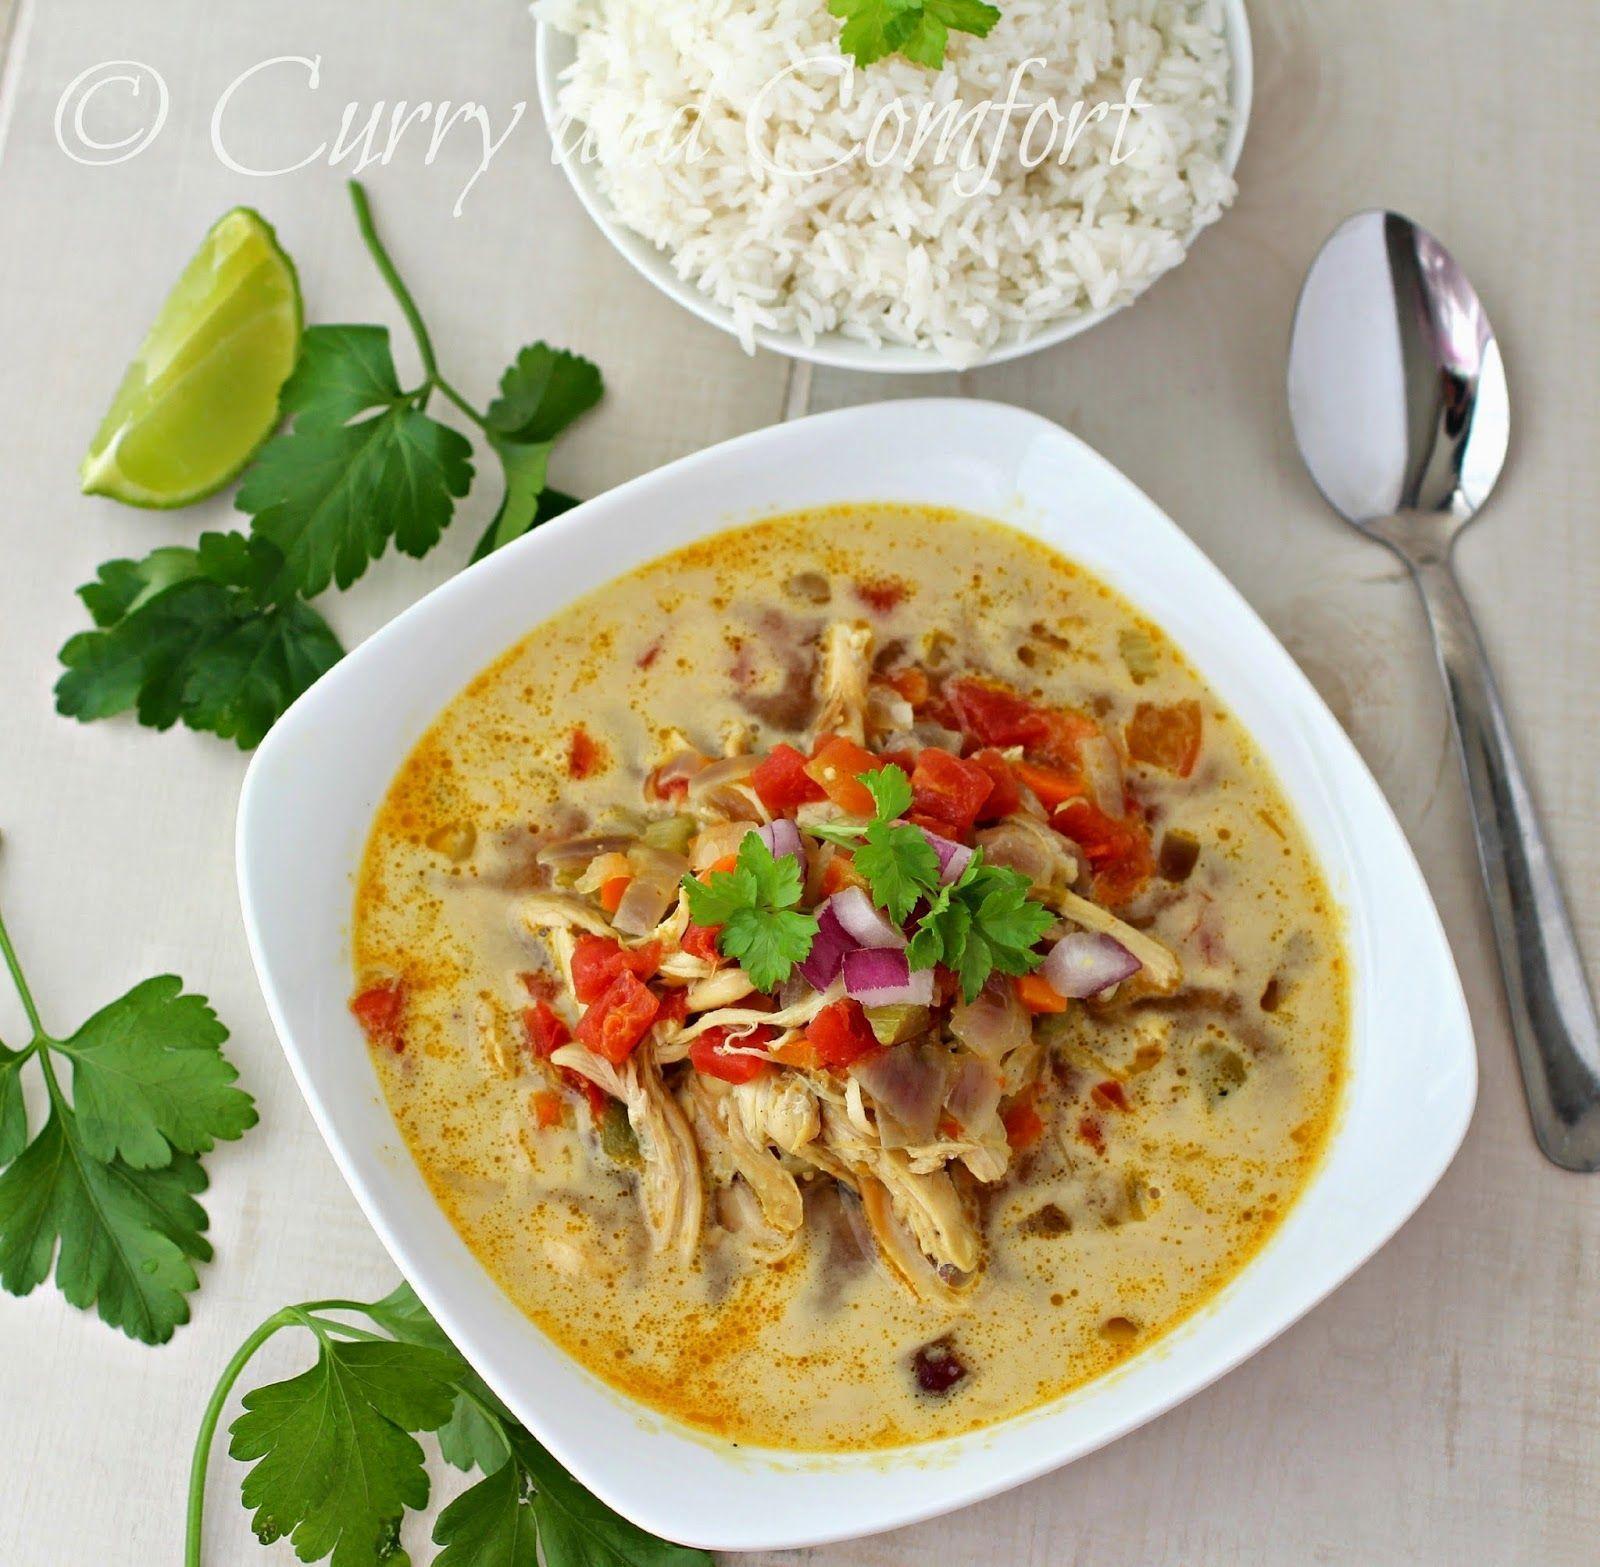 Kitchen Simmer: Sri Lankan Mulligatawny Soup #mulligatawnysoup Kitchen Simmer: Sri Lankan Mulligatawny Soup #mulligatawnysoup Kitchen Simmer: Sri Lankan Mulligatawny Soup #mulligatawnysoup Kitchen Simmer: Sri Lankan Mulligatawny Soup #mulligatawnysoup Kitchen Simmer: Sri Lankan Mulligatawny Soup #mulligatawnysoup Kitchen Simmer: Sri Lankan Mulligatawny Soup #mulligatawnysoup Kitchen Simmer: Sri Lankan Mulligatawny Soup #mulligatawnysoup Kitchen Simmer: Sri Lankan Mulligatawny Soup #mulligatawnysoup